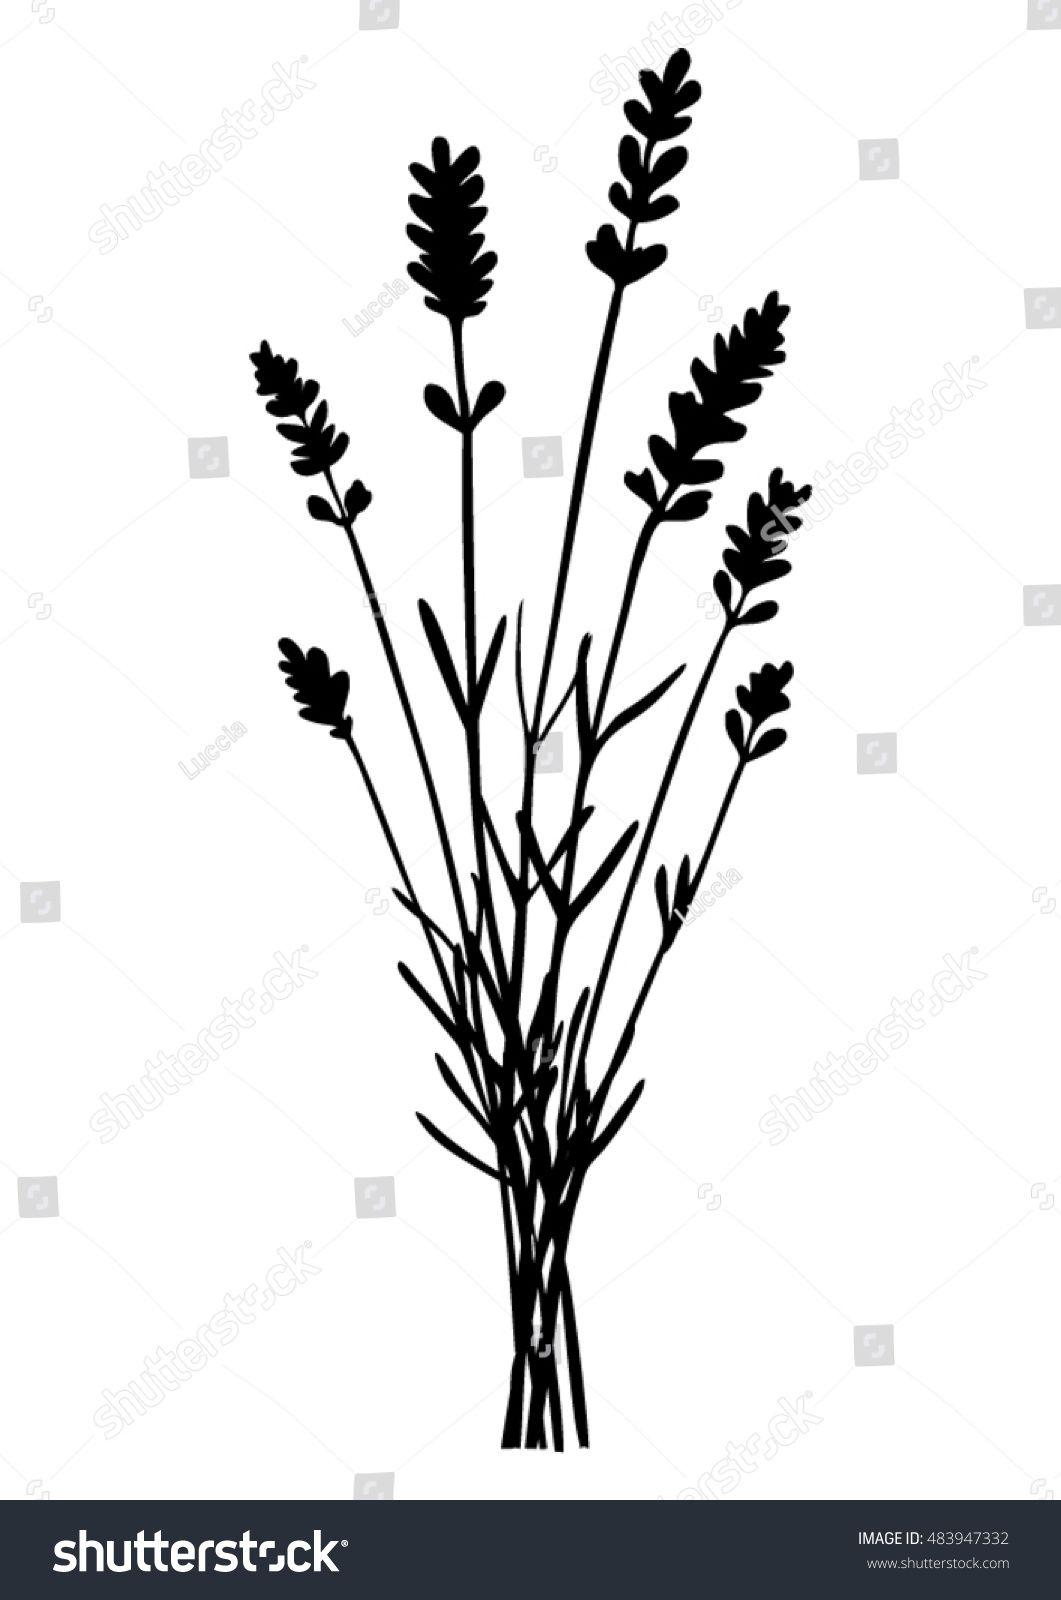 Bunch Of Lavender Flowers Black Silhouette Vector Lavender